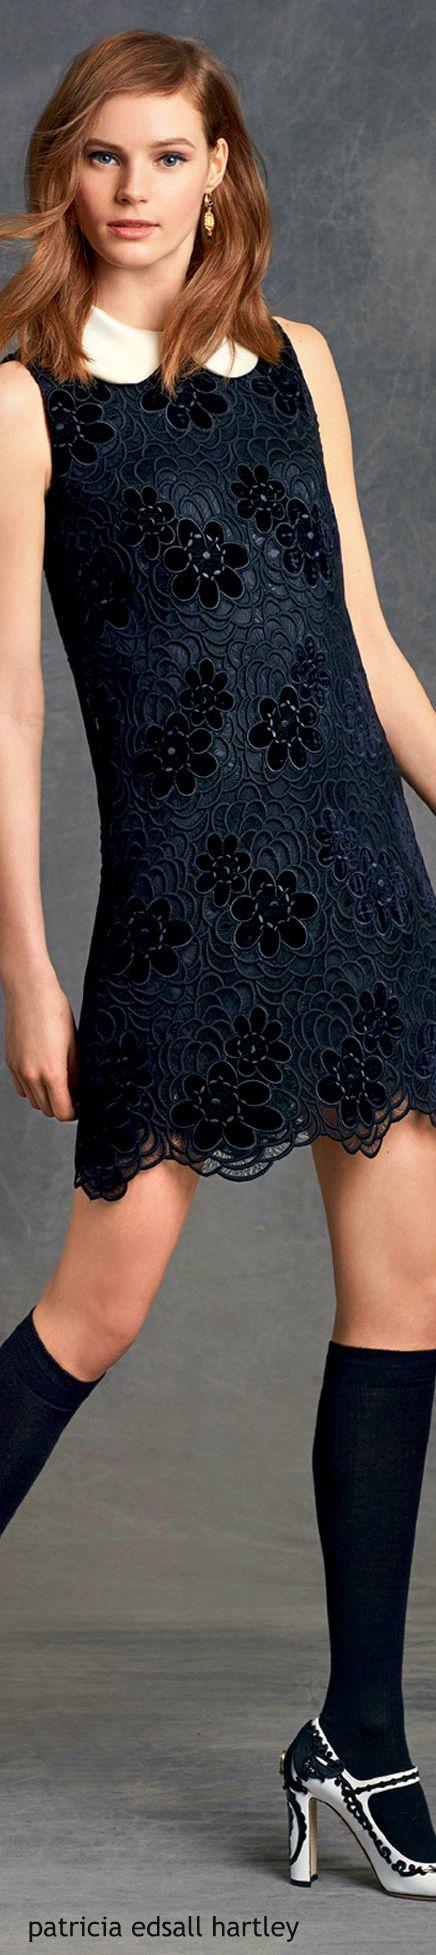 Dolce & Gabbana - Winter 2016 black lace dress.  women fashion outfit clothing stylish apparel @roressclothes closet ideas